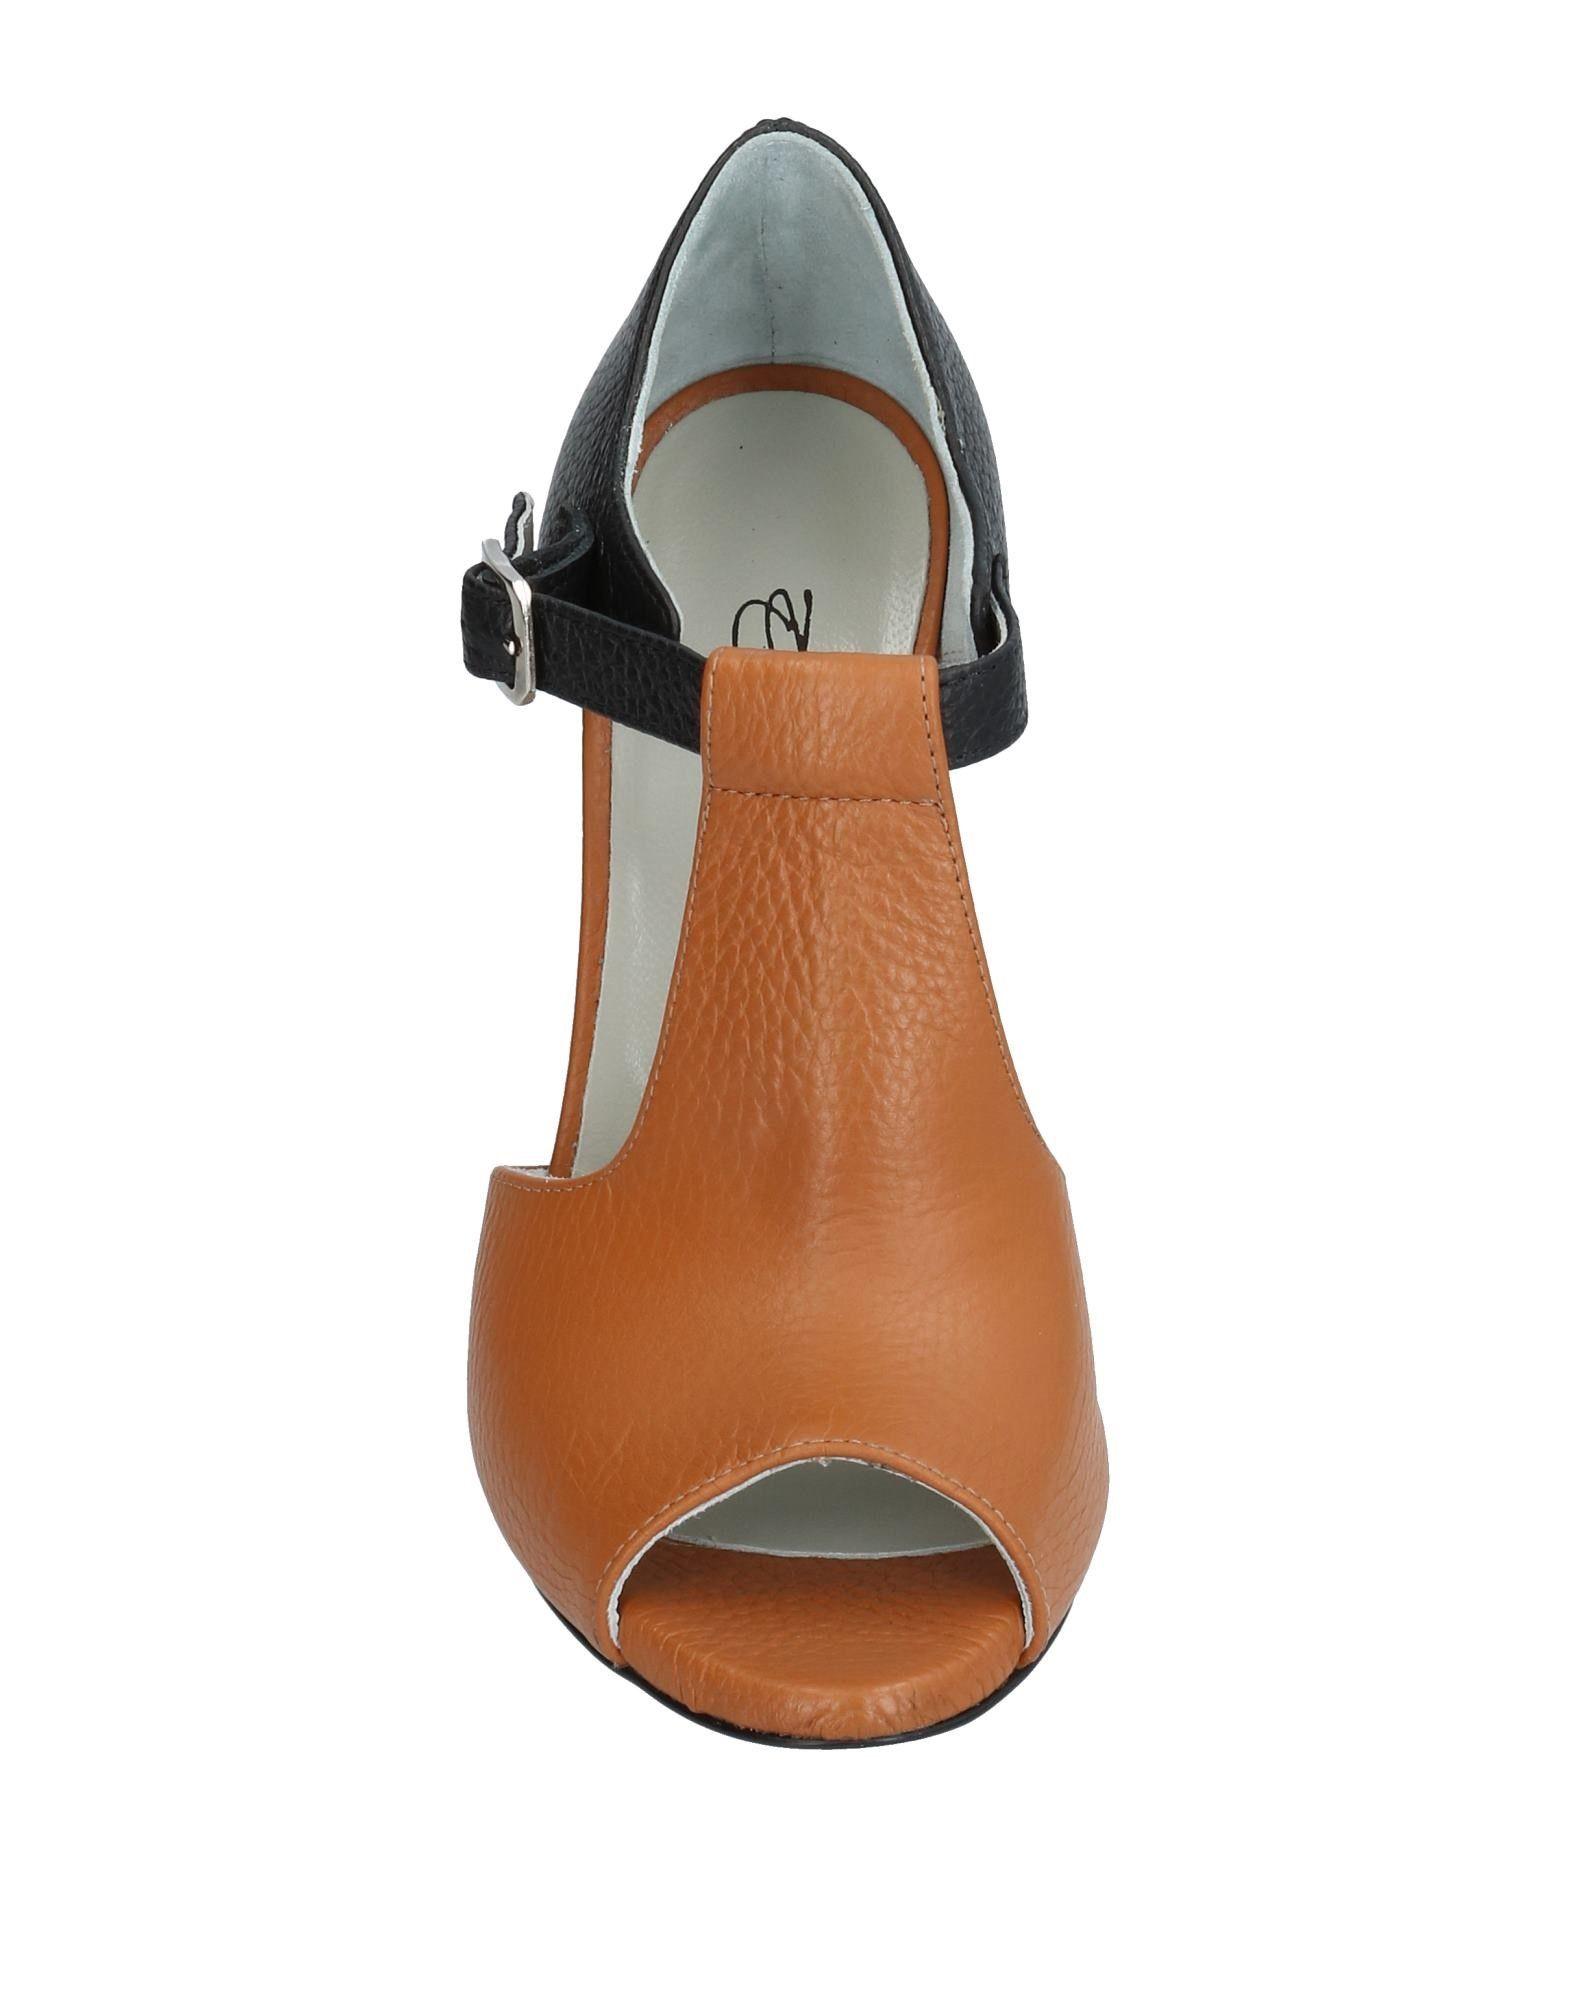 Emanuela 11331671HH Passeri Sandalen Damen  11331671HH Emanuela Gute Qualität beliebte Schuhe fb4e8e